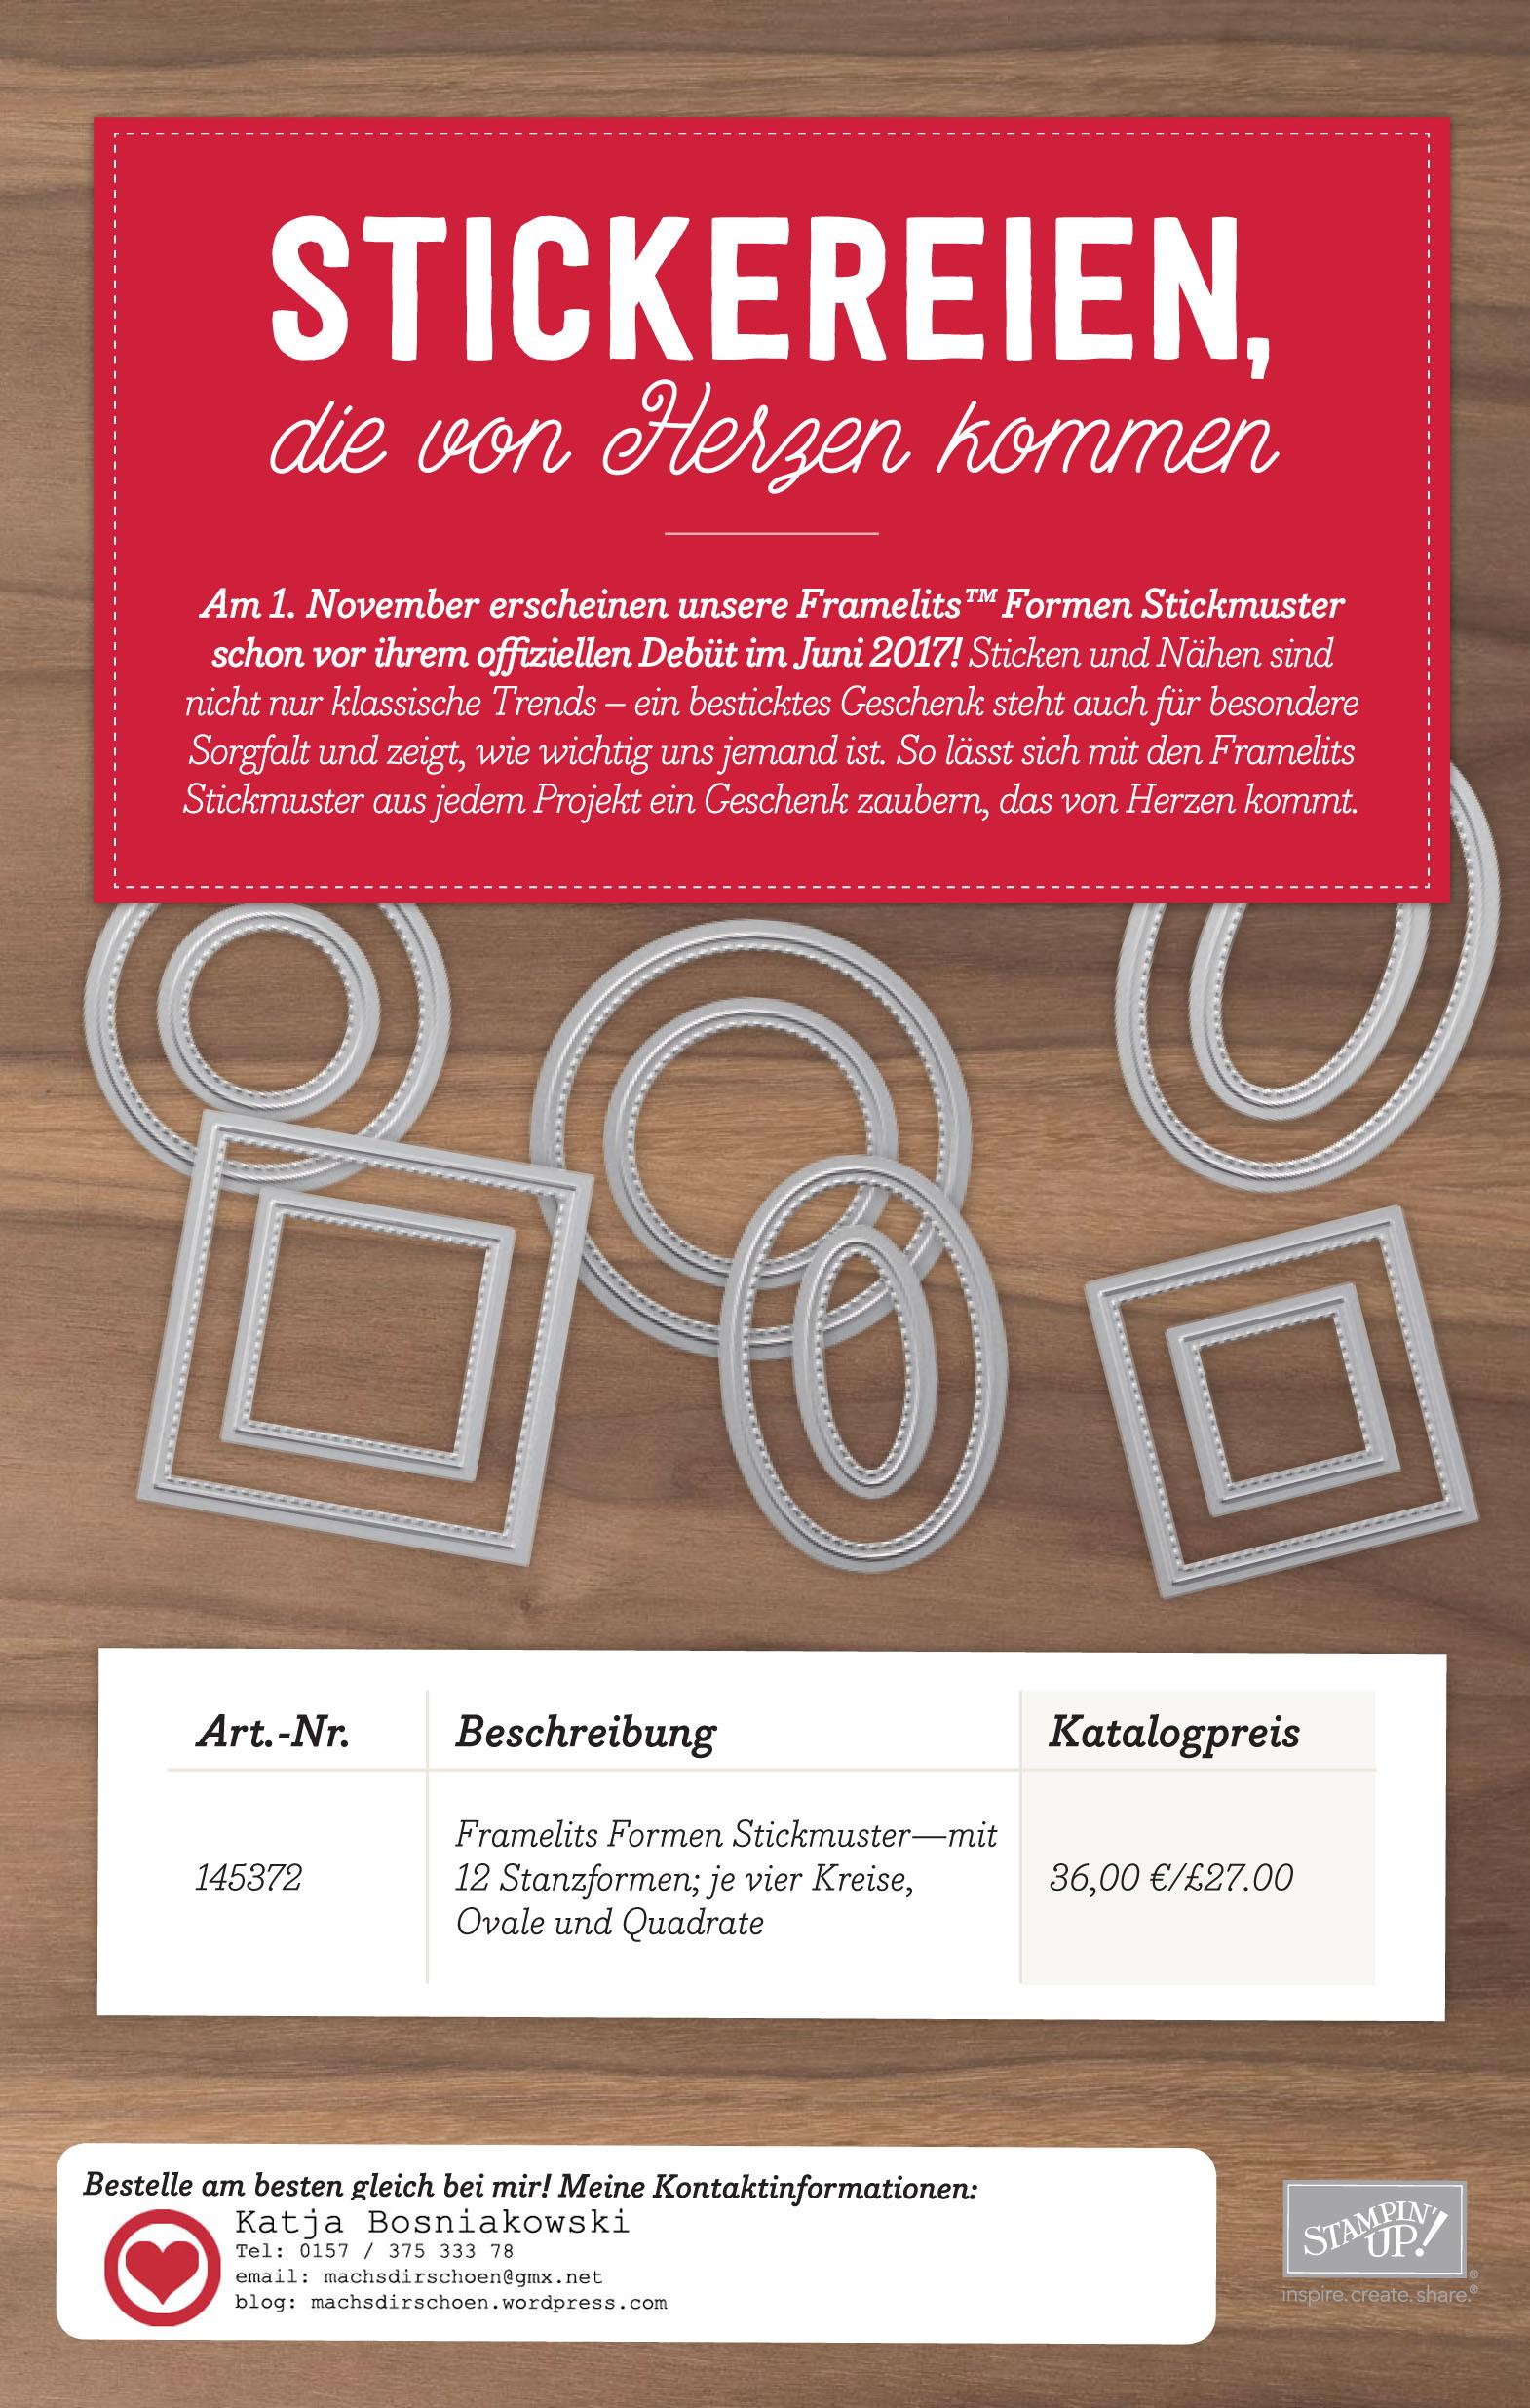 stitchframelit_flyer2_de